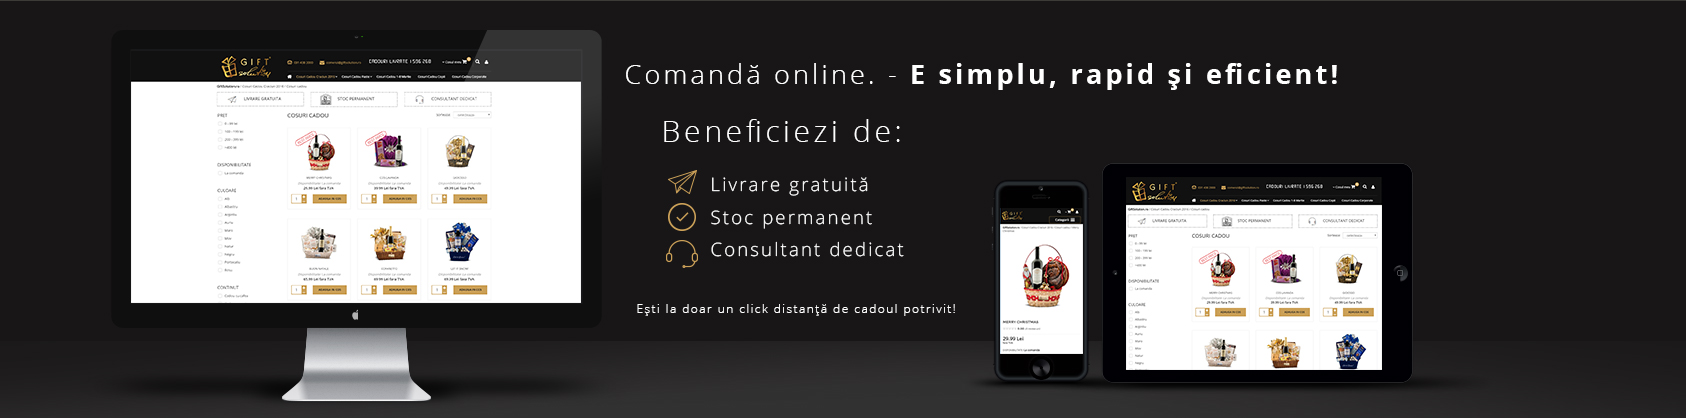 Comanda online simplu